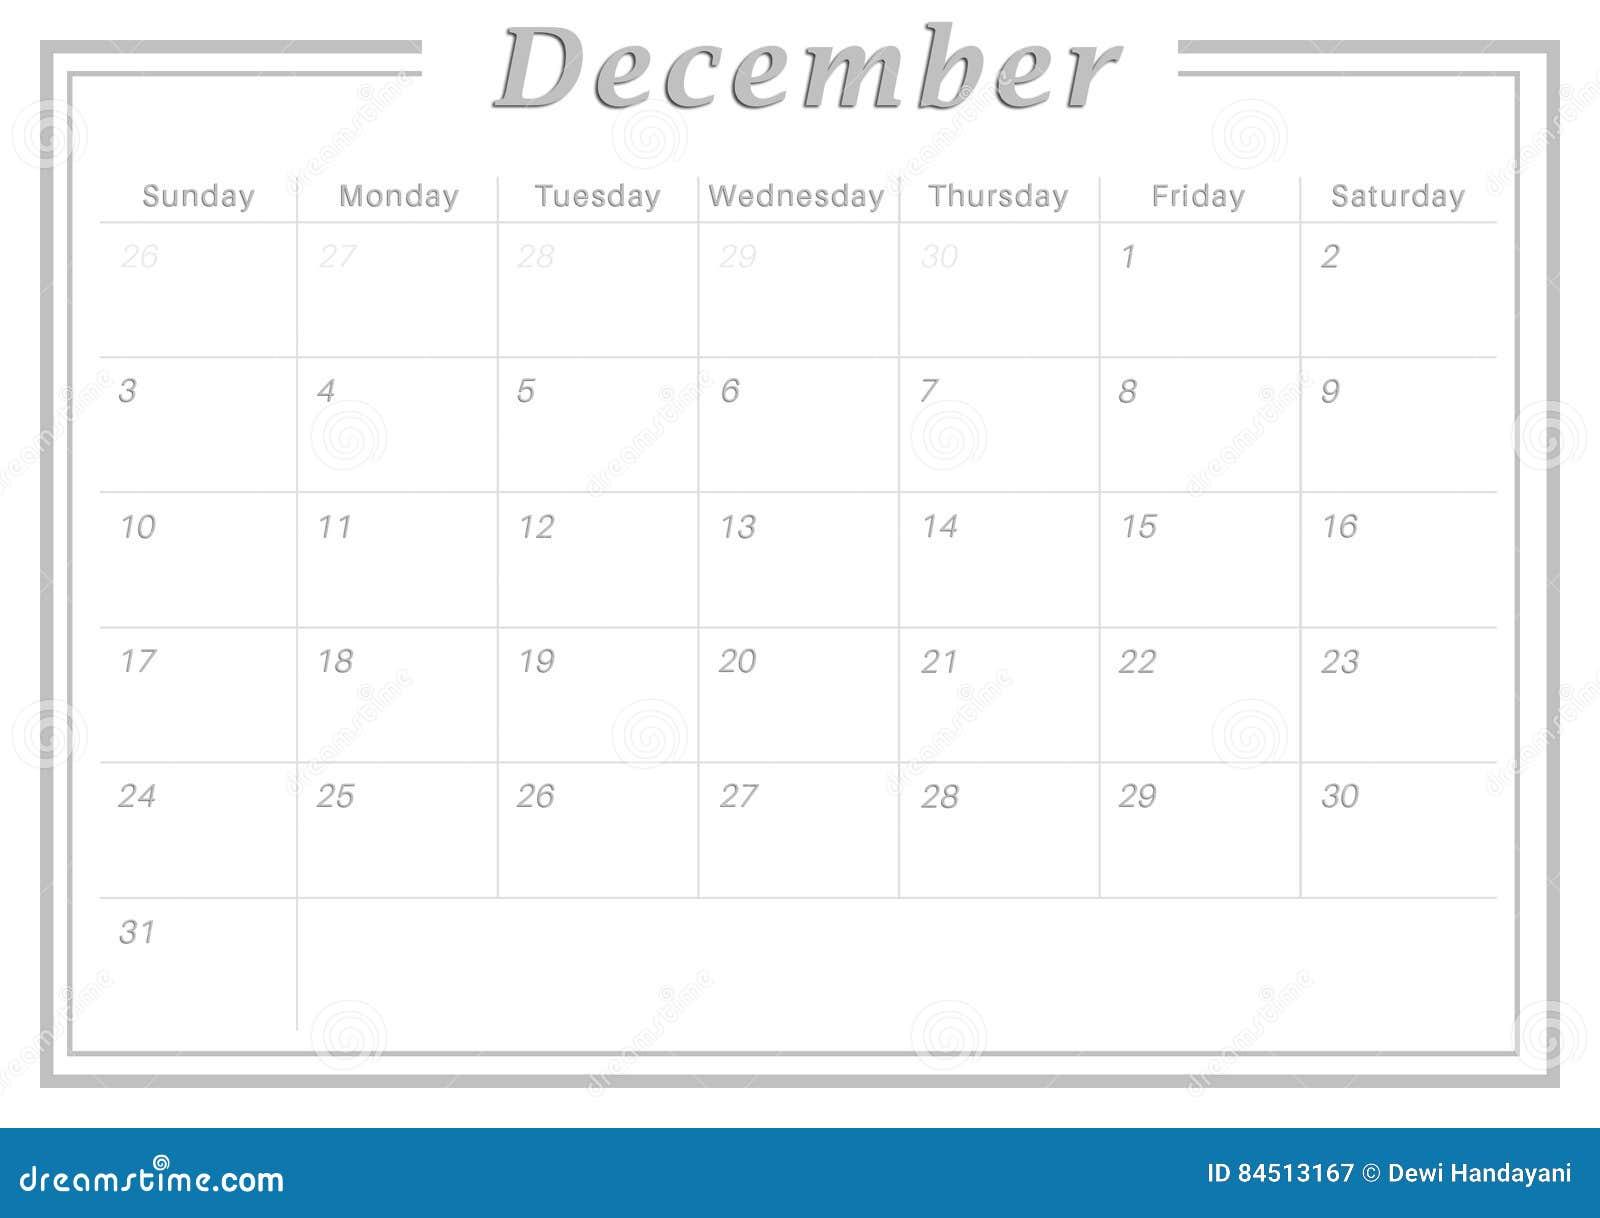 december monthly calender